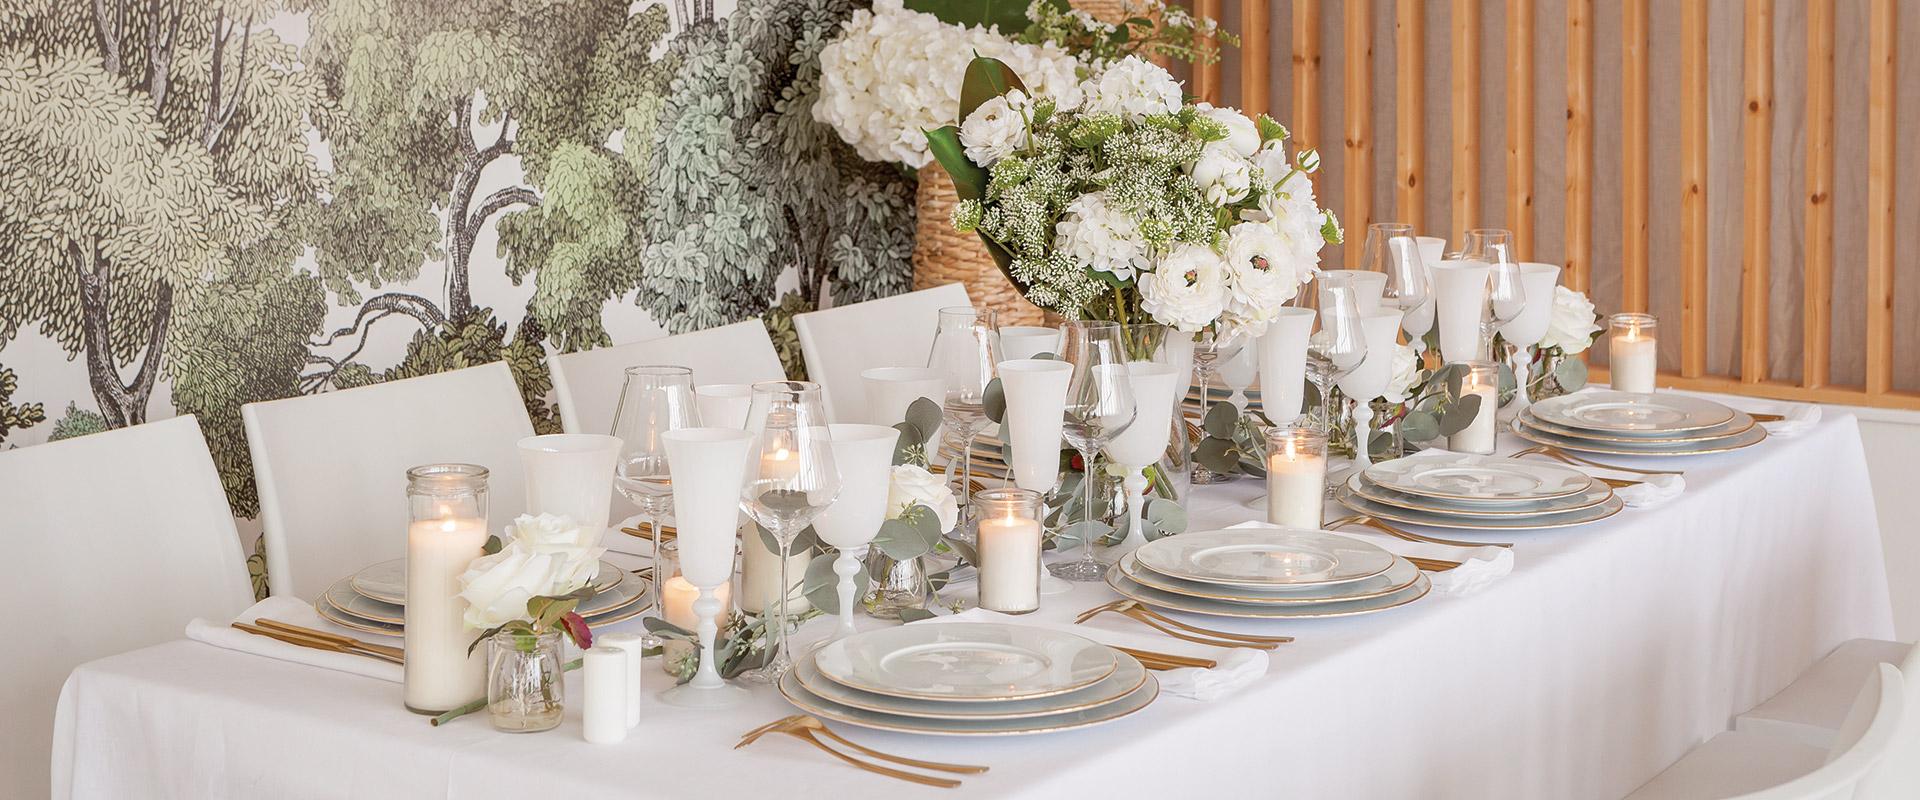 Table Blanc Végétal